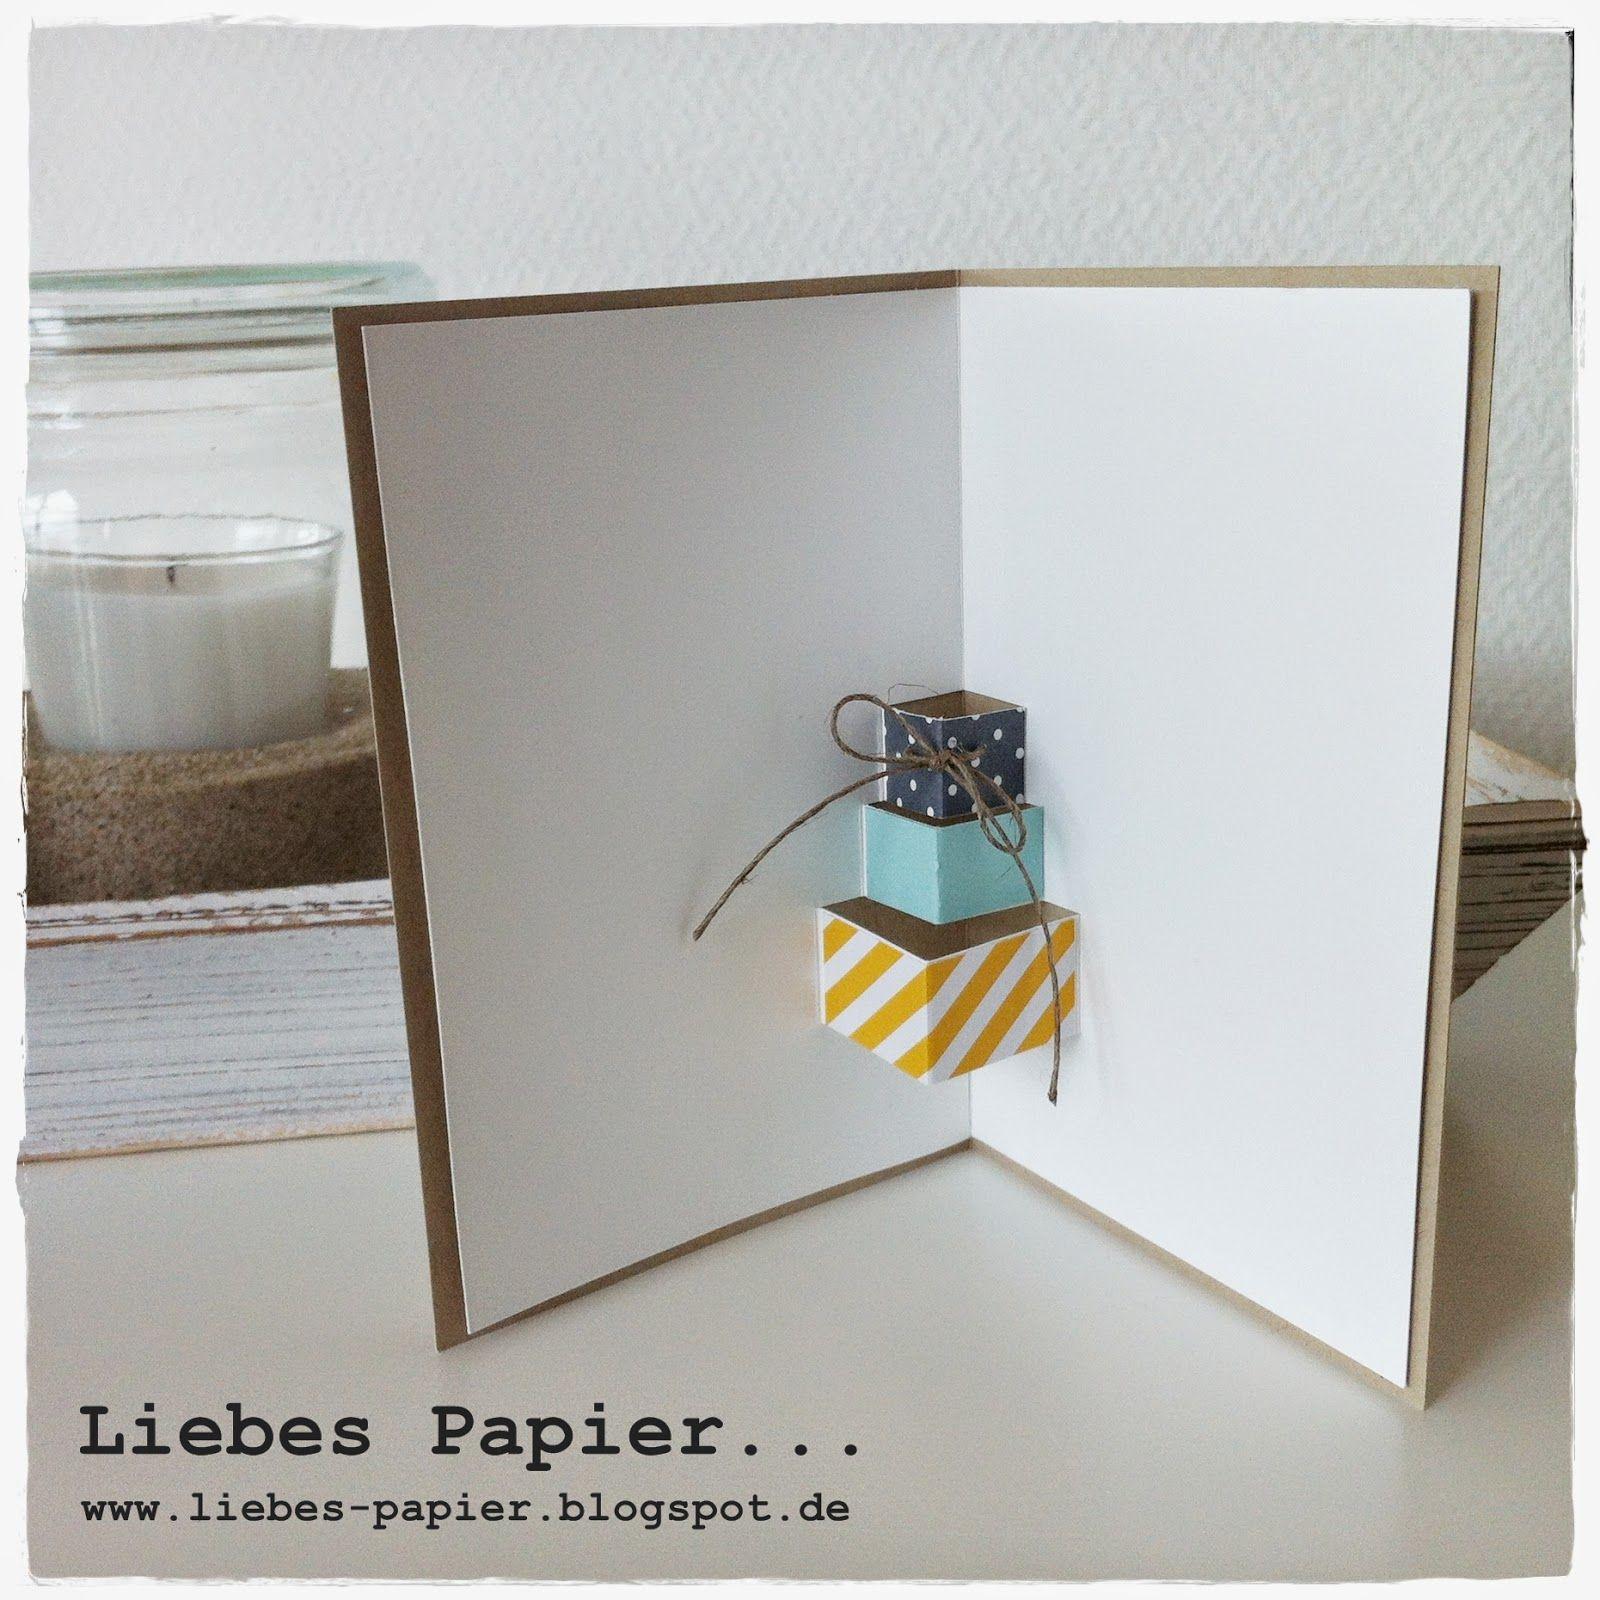 liebes papier anleitung zur torte pop up. Black Bedroom Furniture Sets. Home Design Ideas